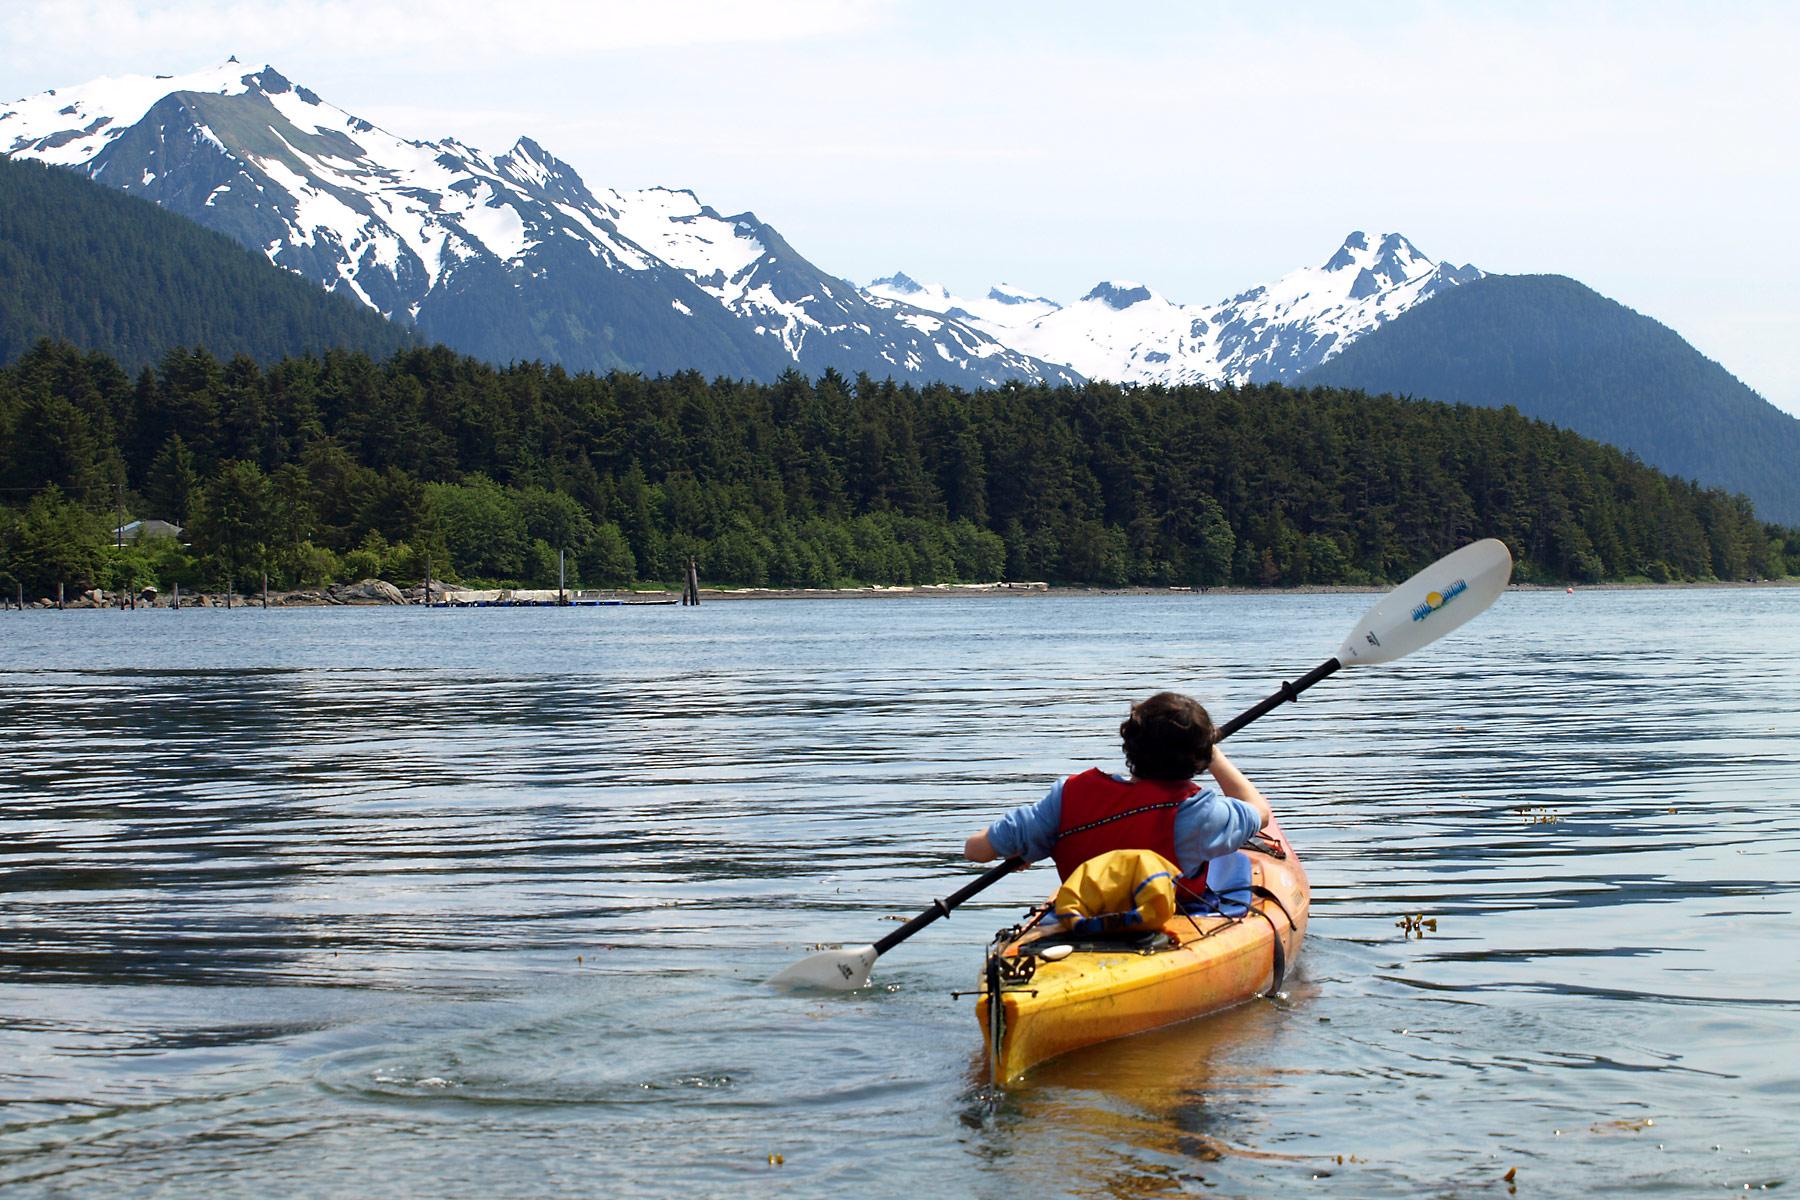 SUMMER KAYAKING IN ALASKA